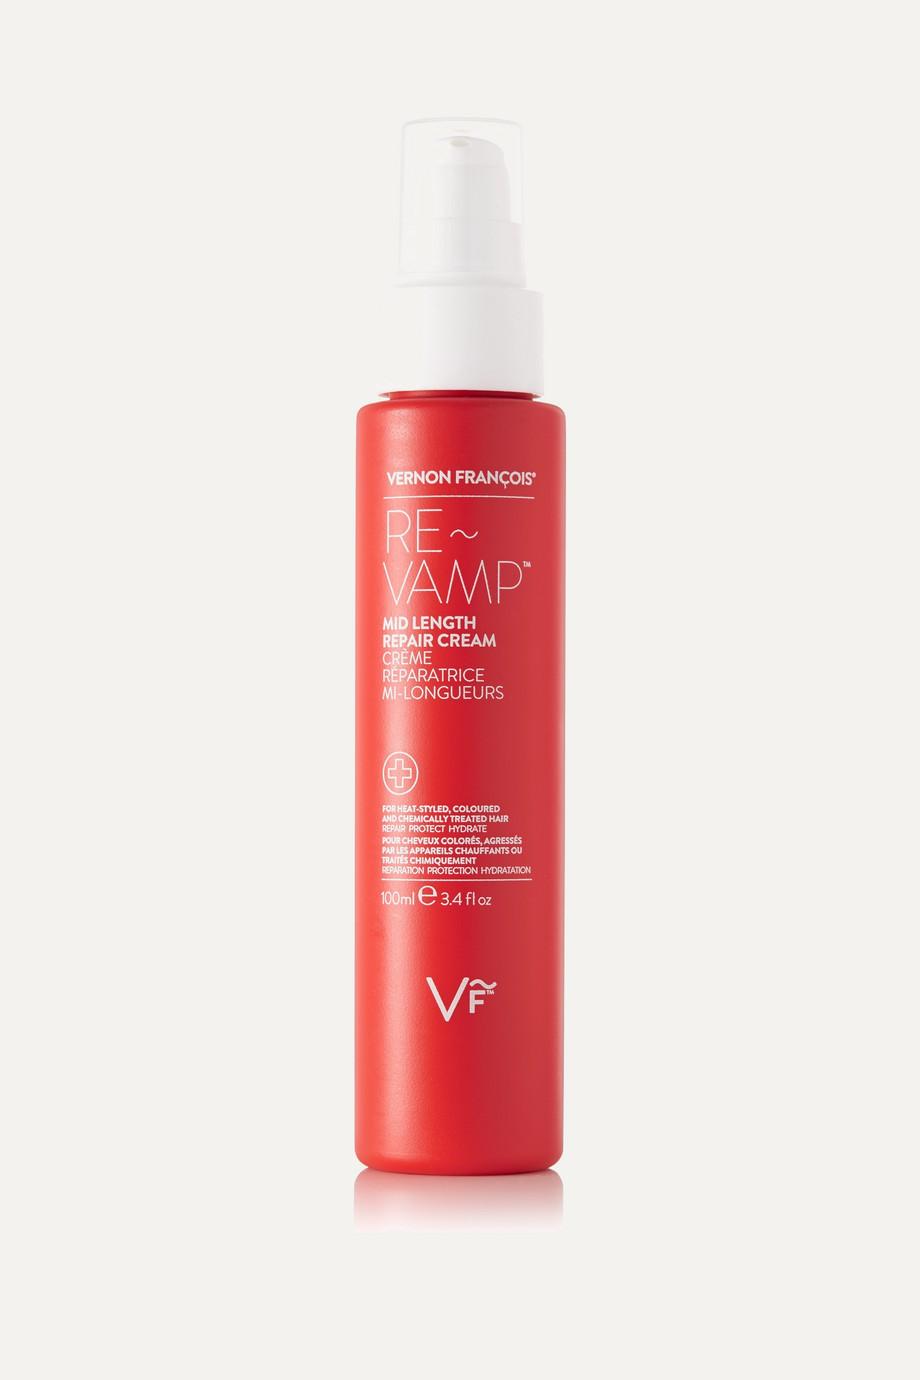 Vernon François Re-Vamp Mid Length Repair Cream, 100ml